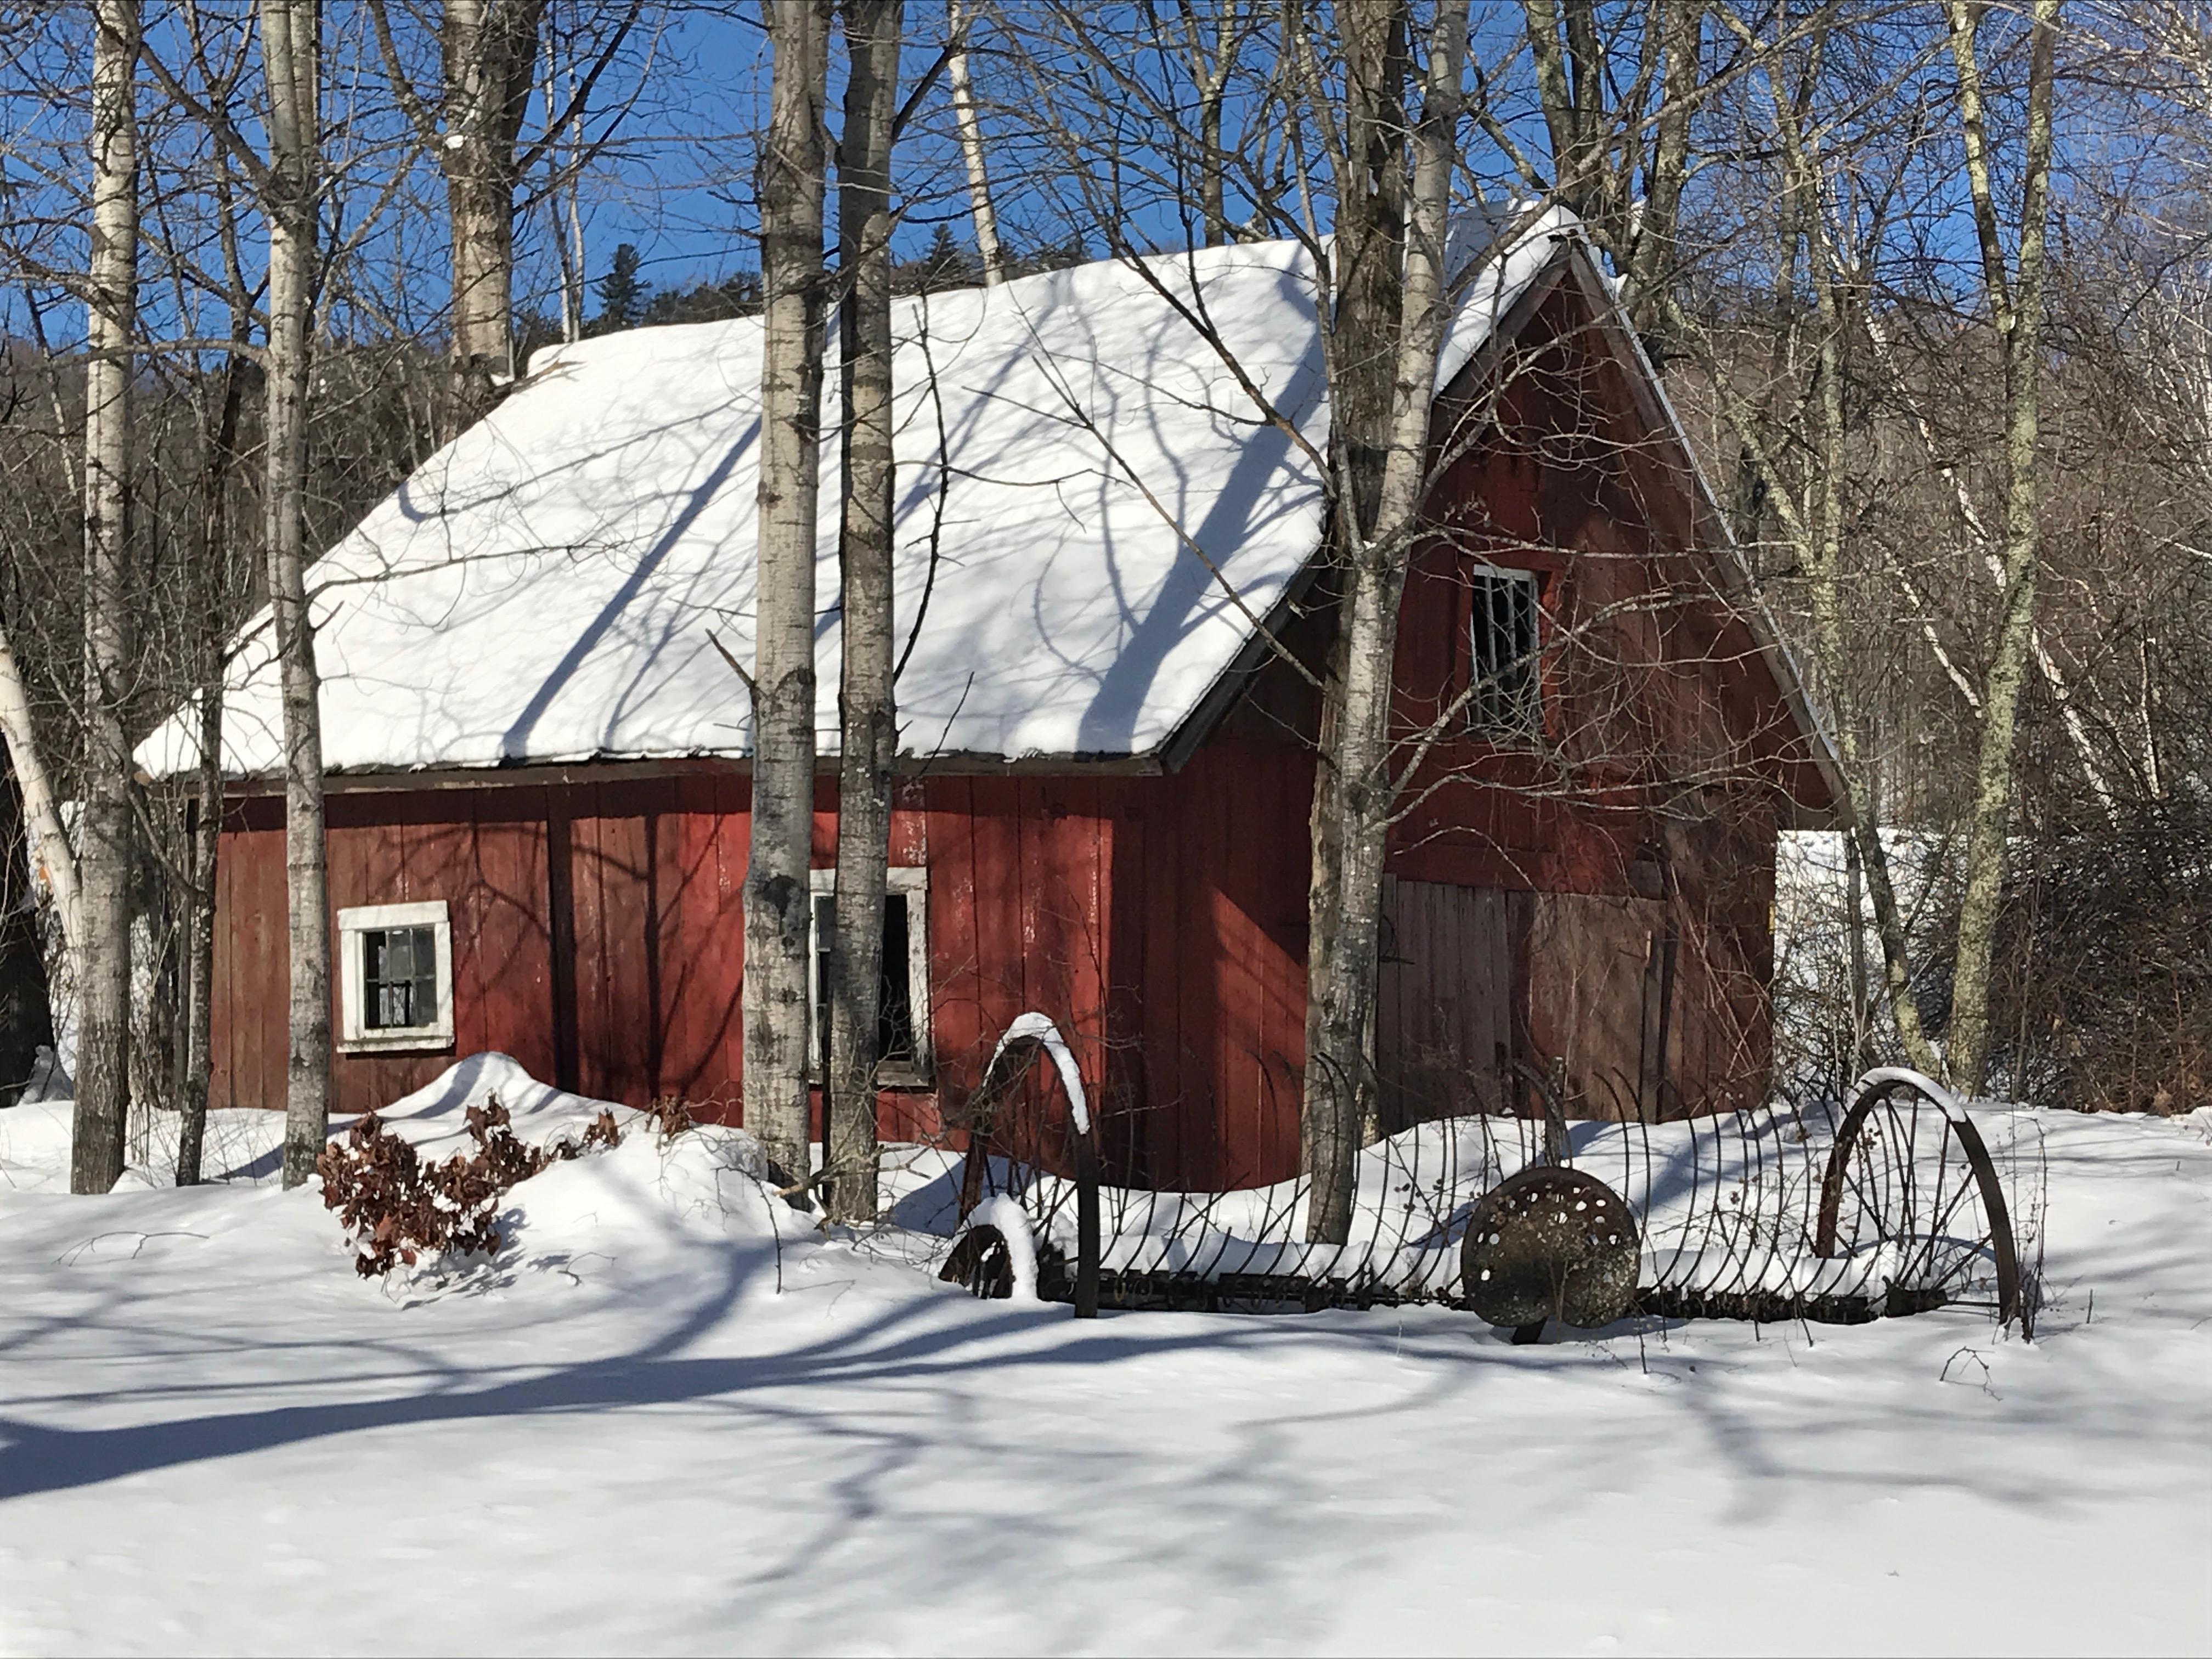 Vermont farm corn crib from 1830